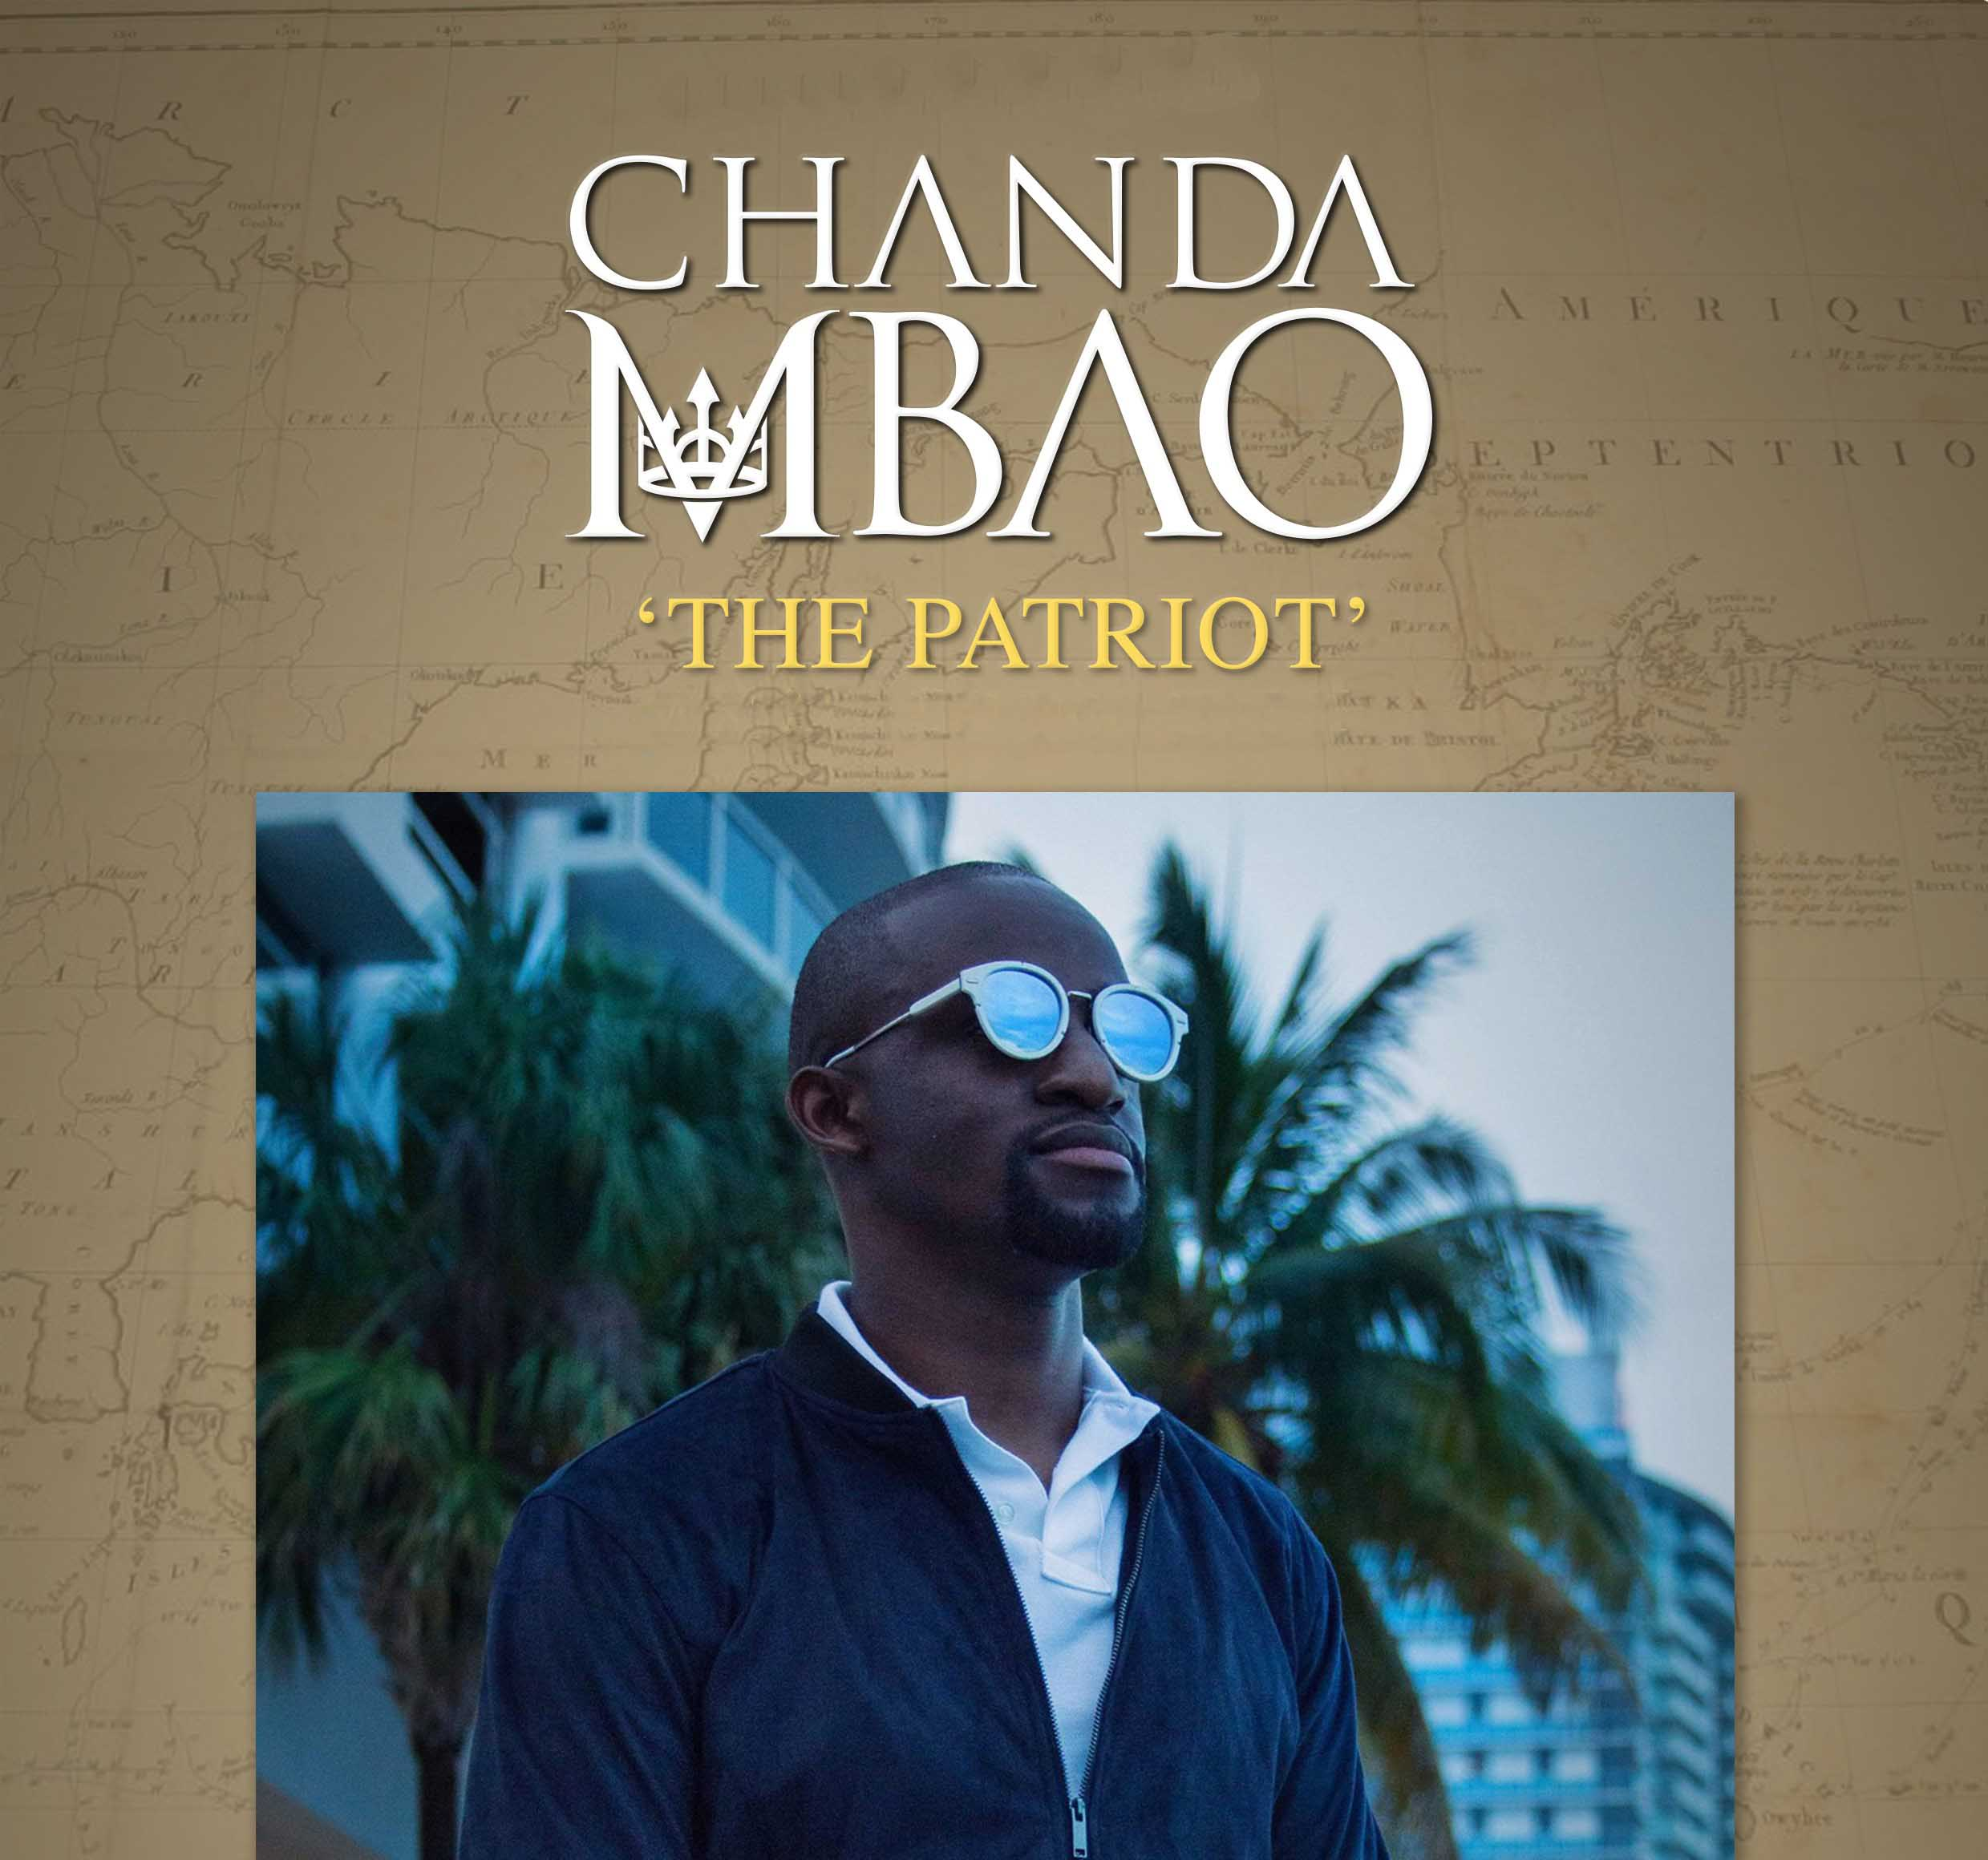 Mixtape Review: Chanda Mbao – The Patriot